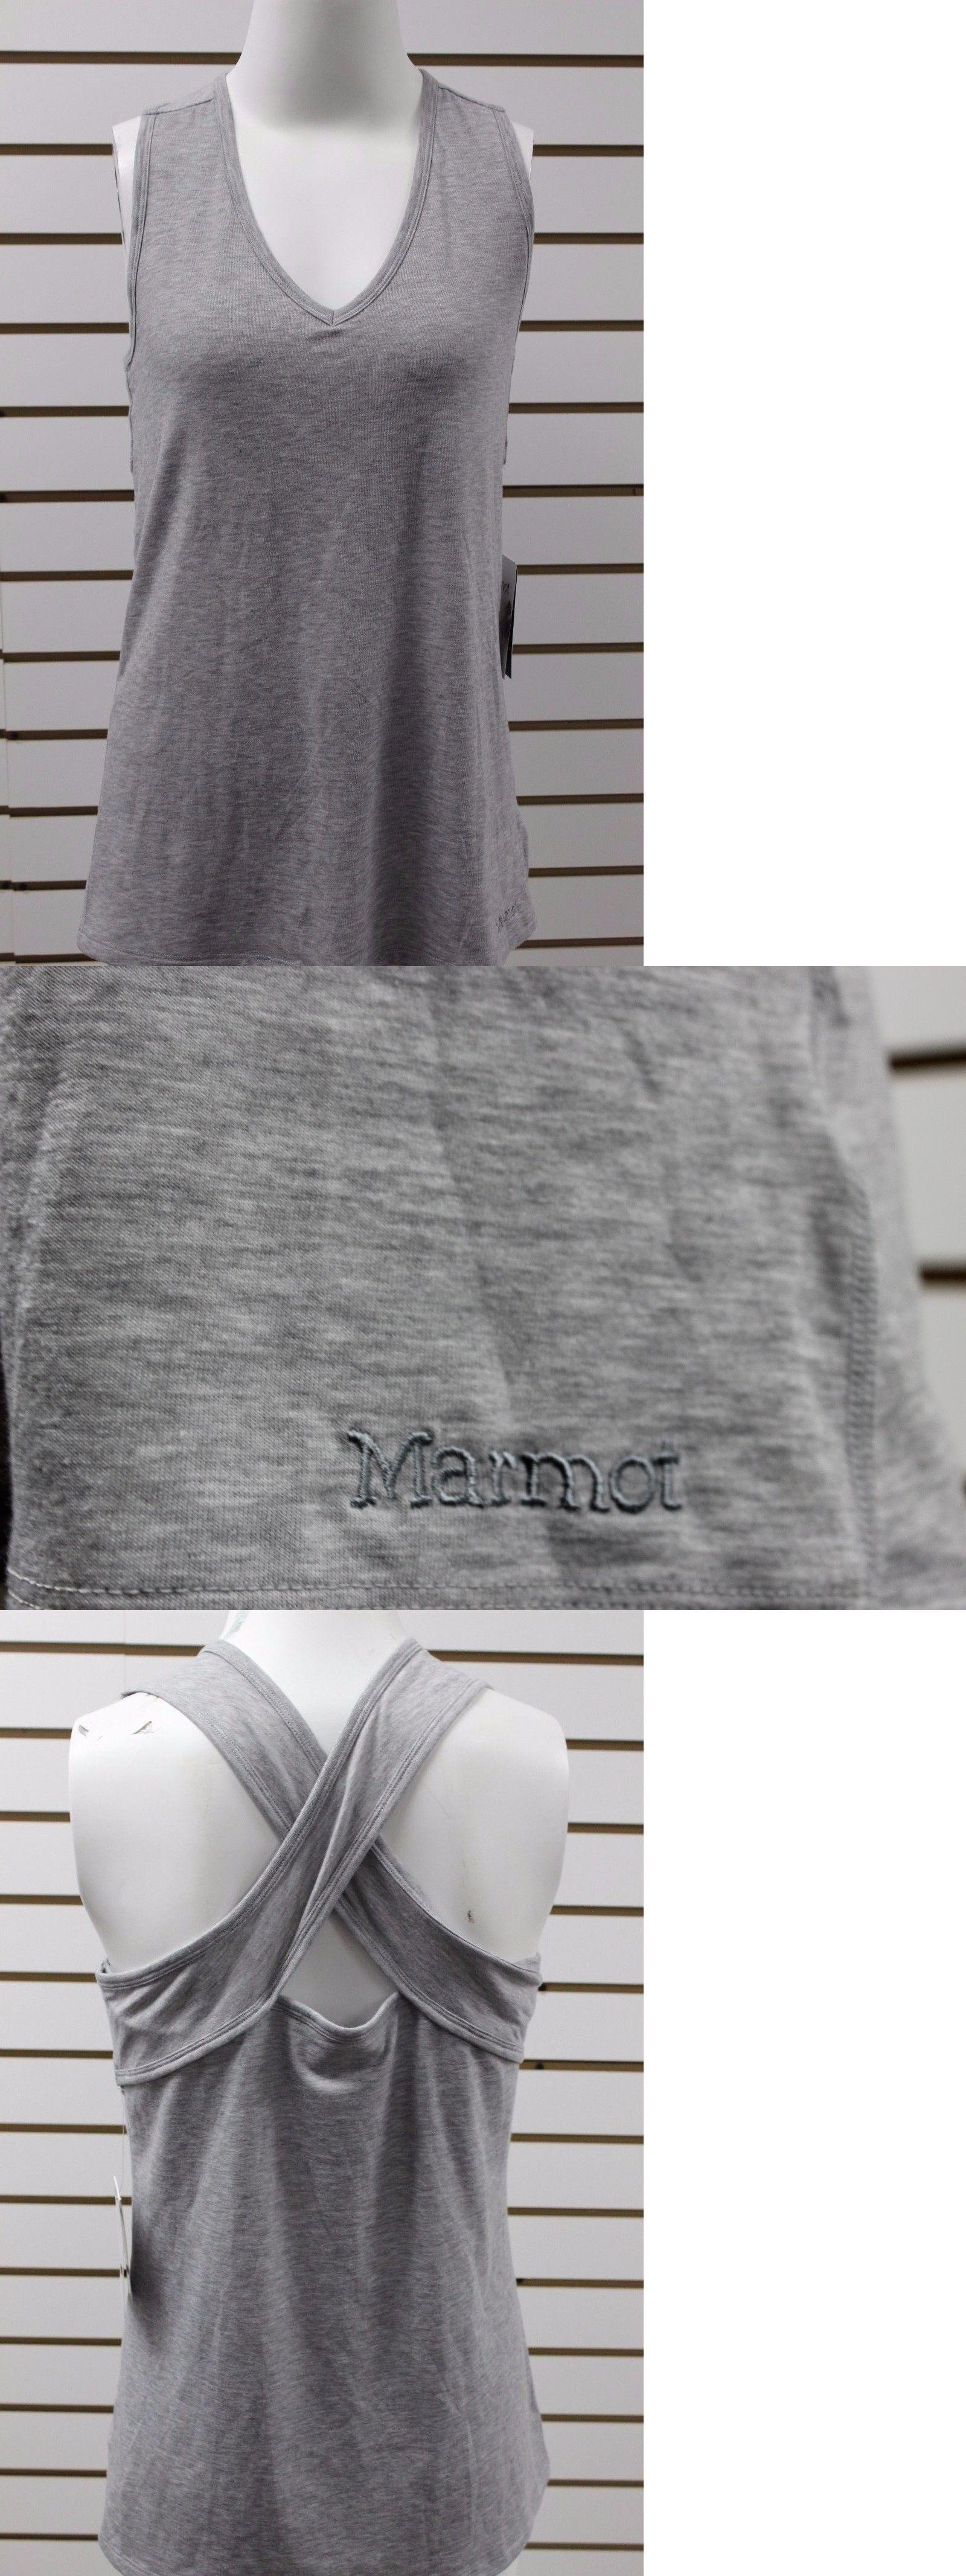 Shirts 59333: Women S Marmot Nila Sleeveless Tank Steel Heather 67620 Brand  New With Tag